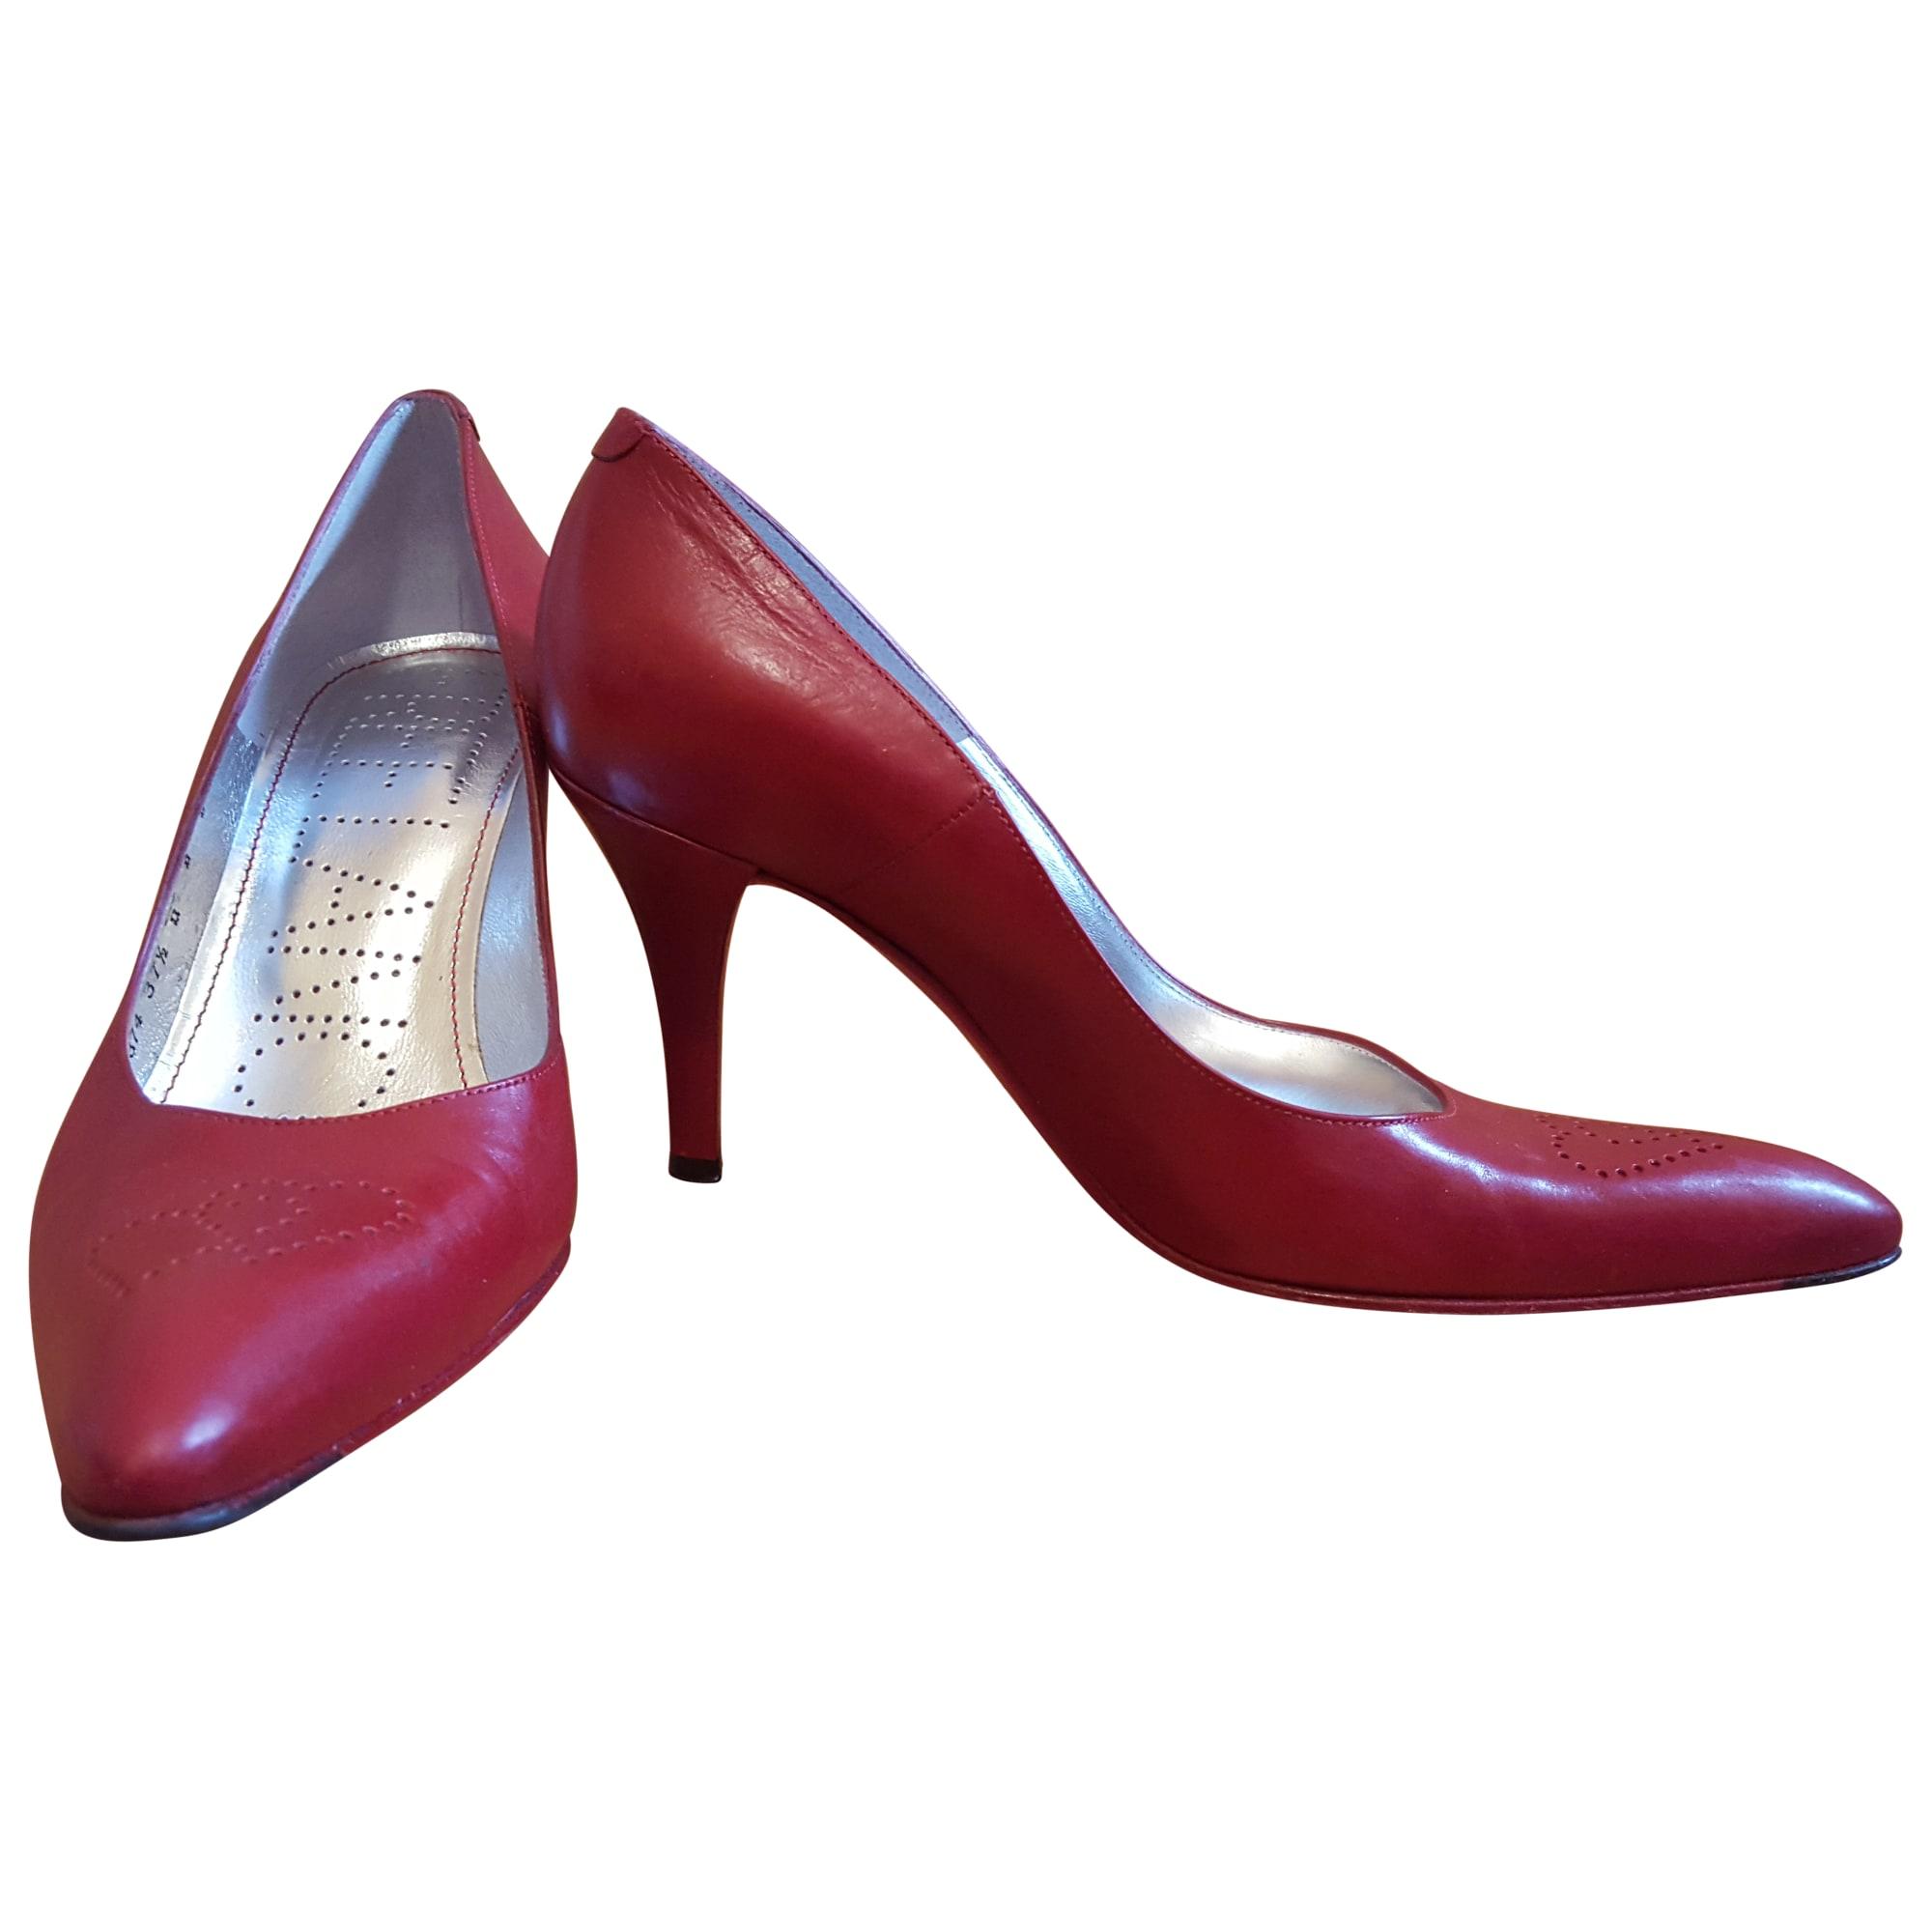 f4ffb83b808796 Escarpins FREE LANCE 37,5 rouge vendu par Charlotte 504504028 - 4040151